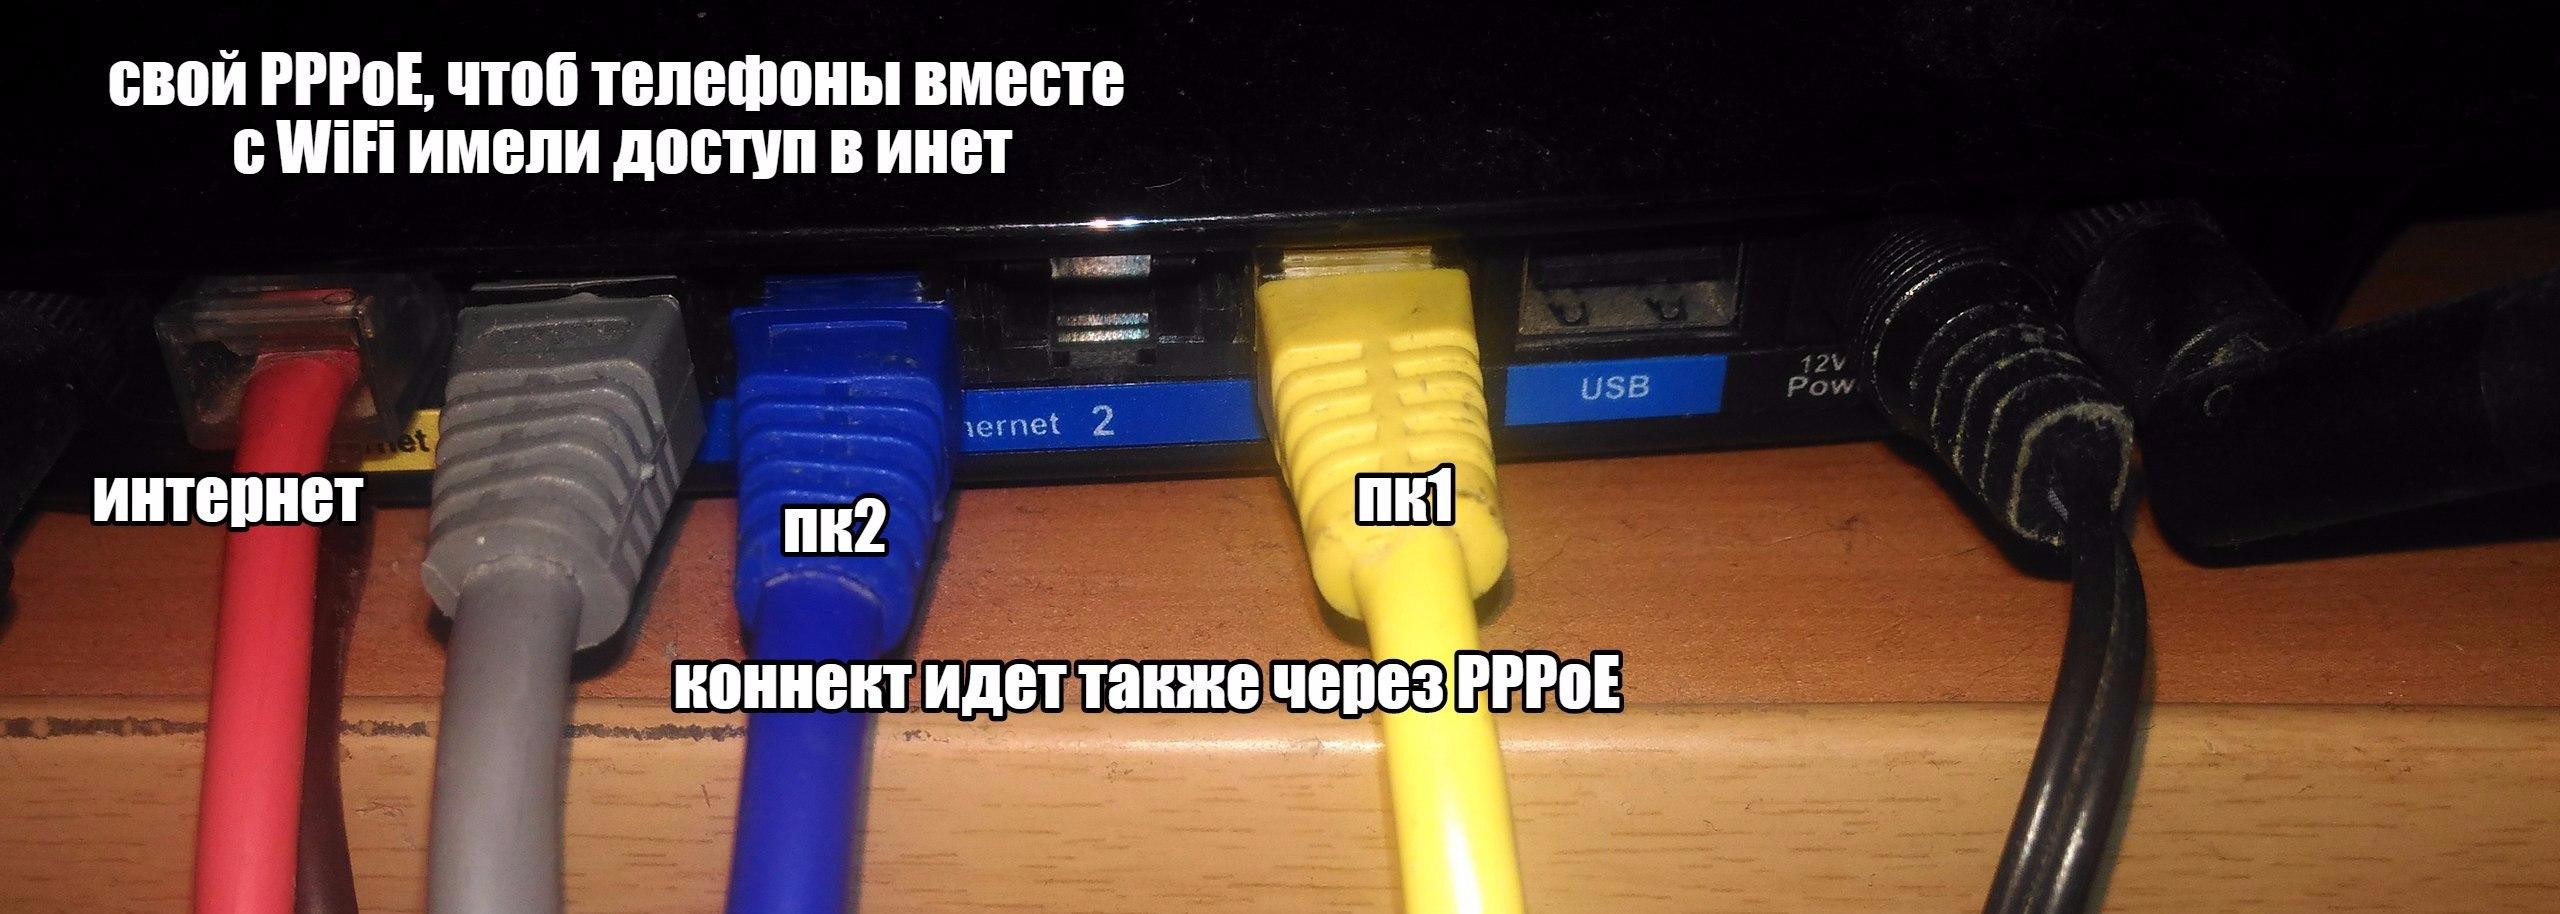 n1vTnH-cP5s.jpg